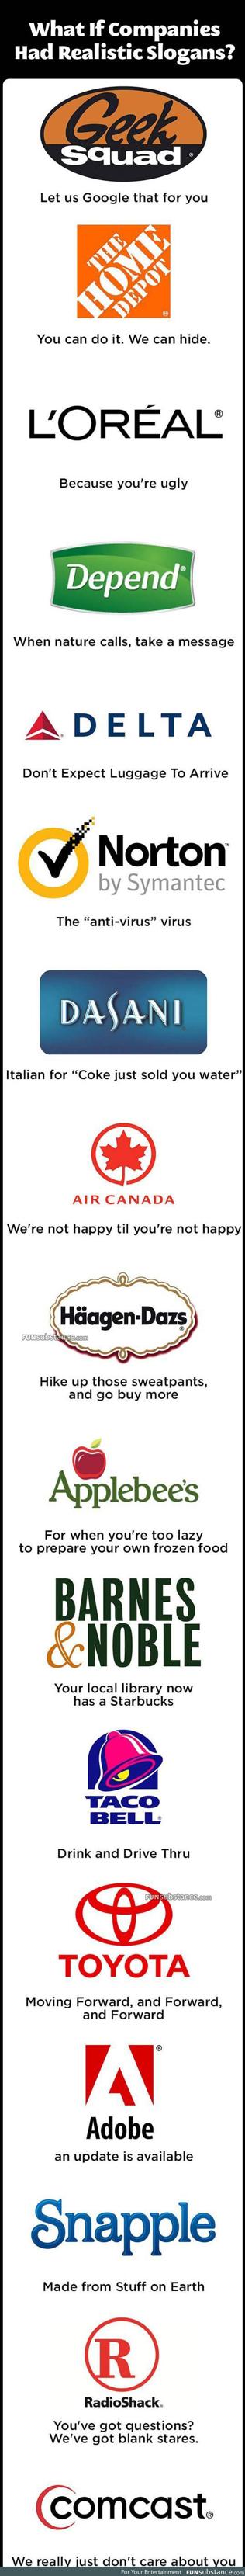 If companies had realistic slogans